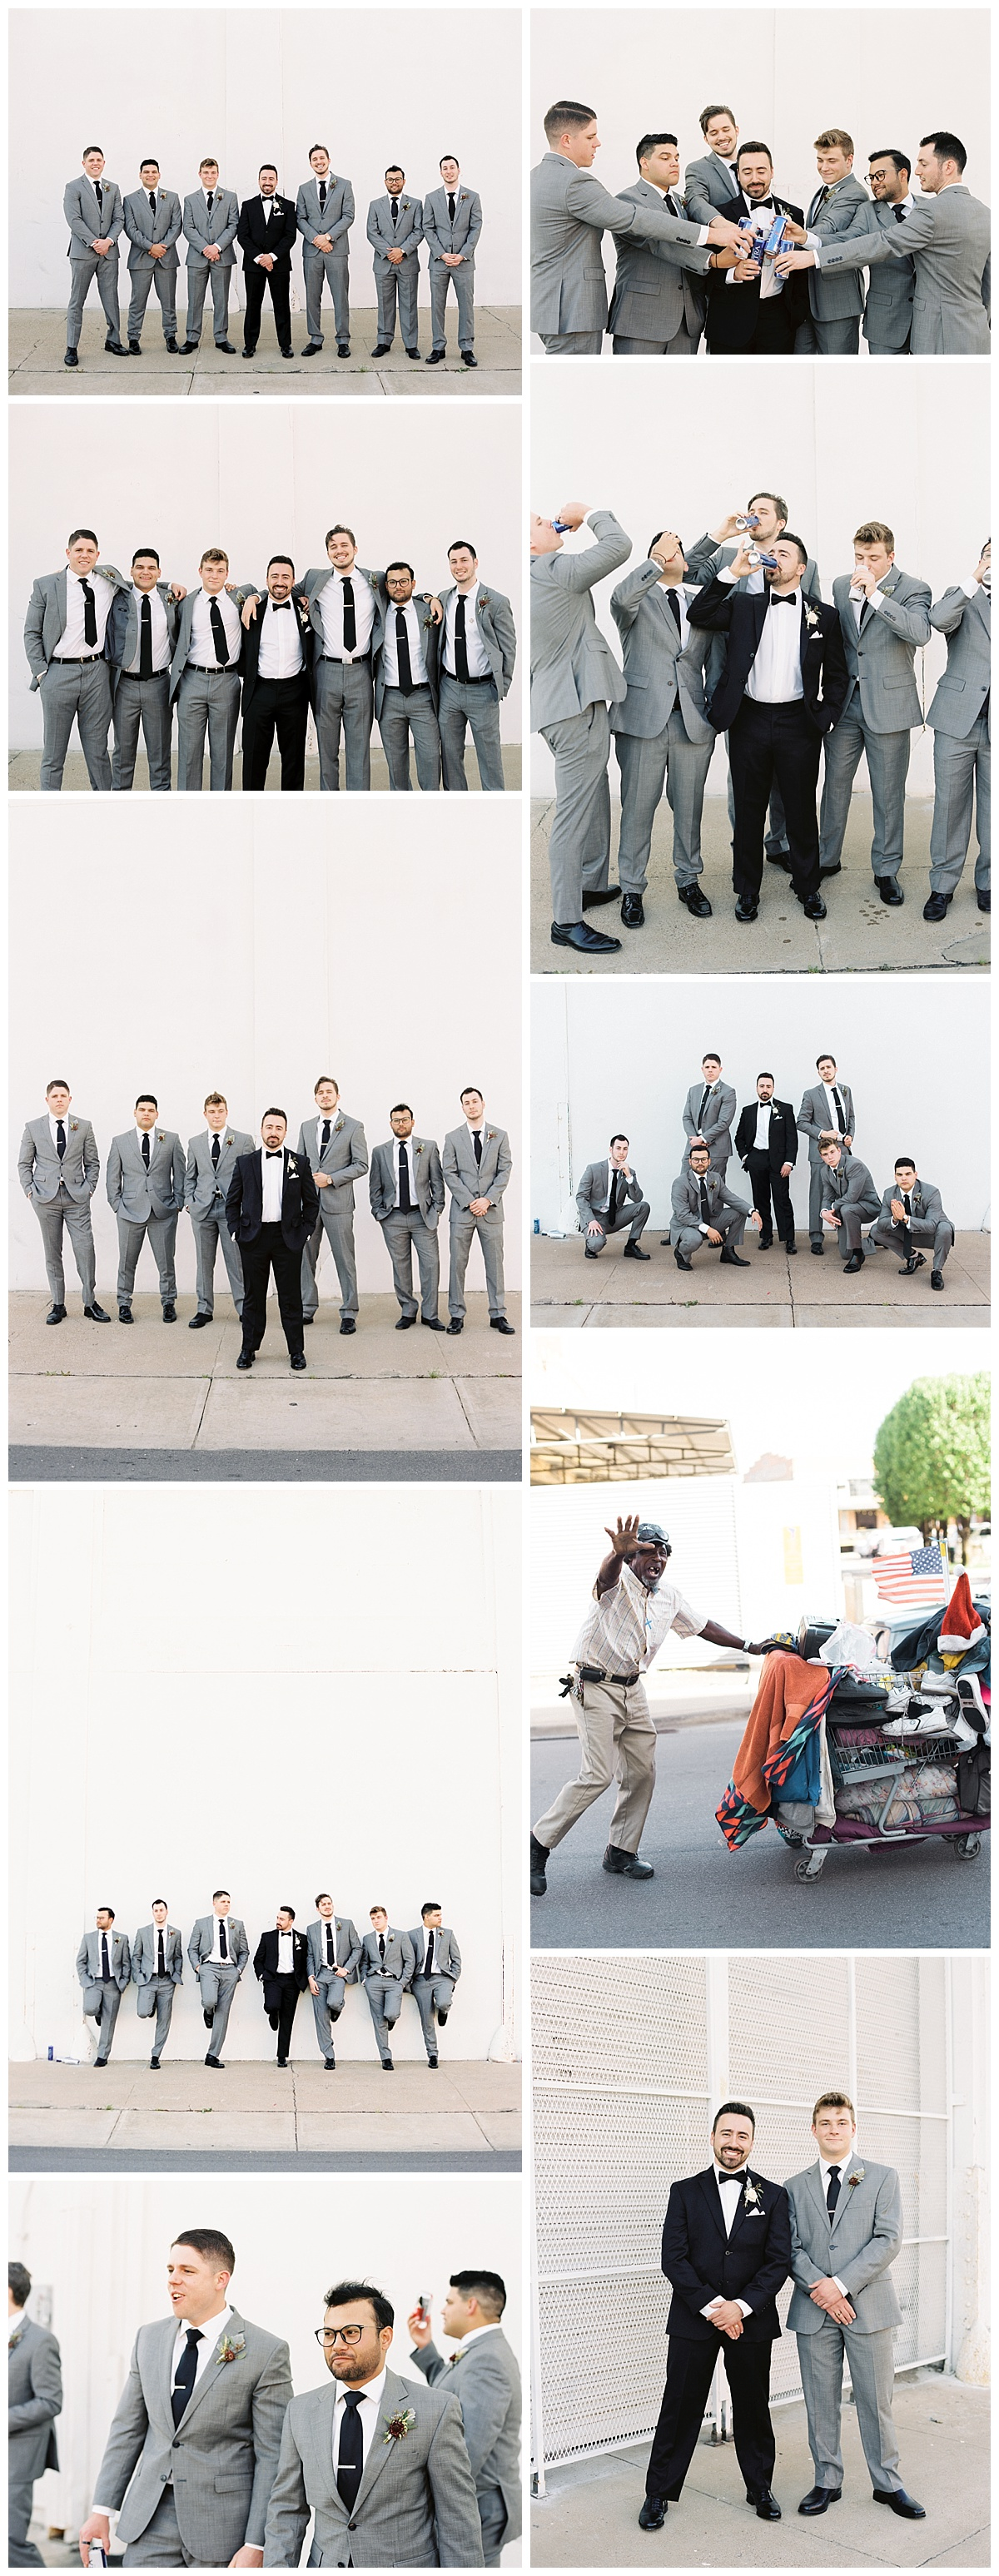 hickory-stree-annex-wedding-ar-photography-nicole-nolan-9.jpg